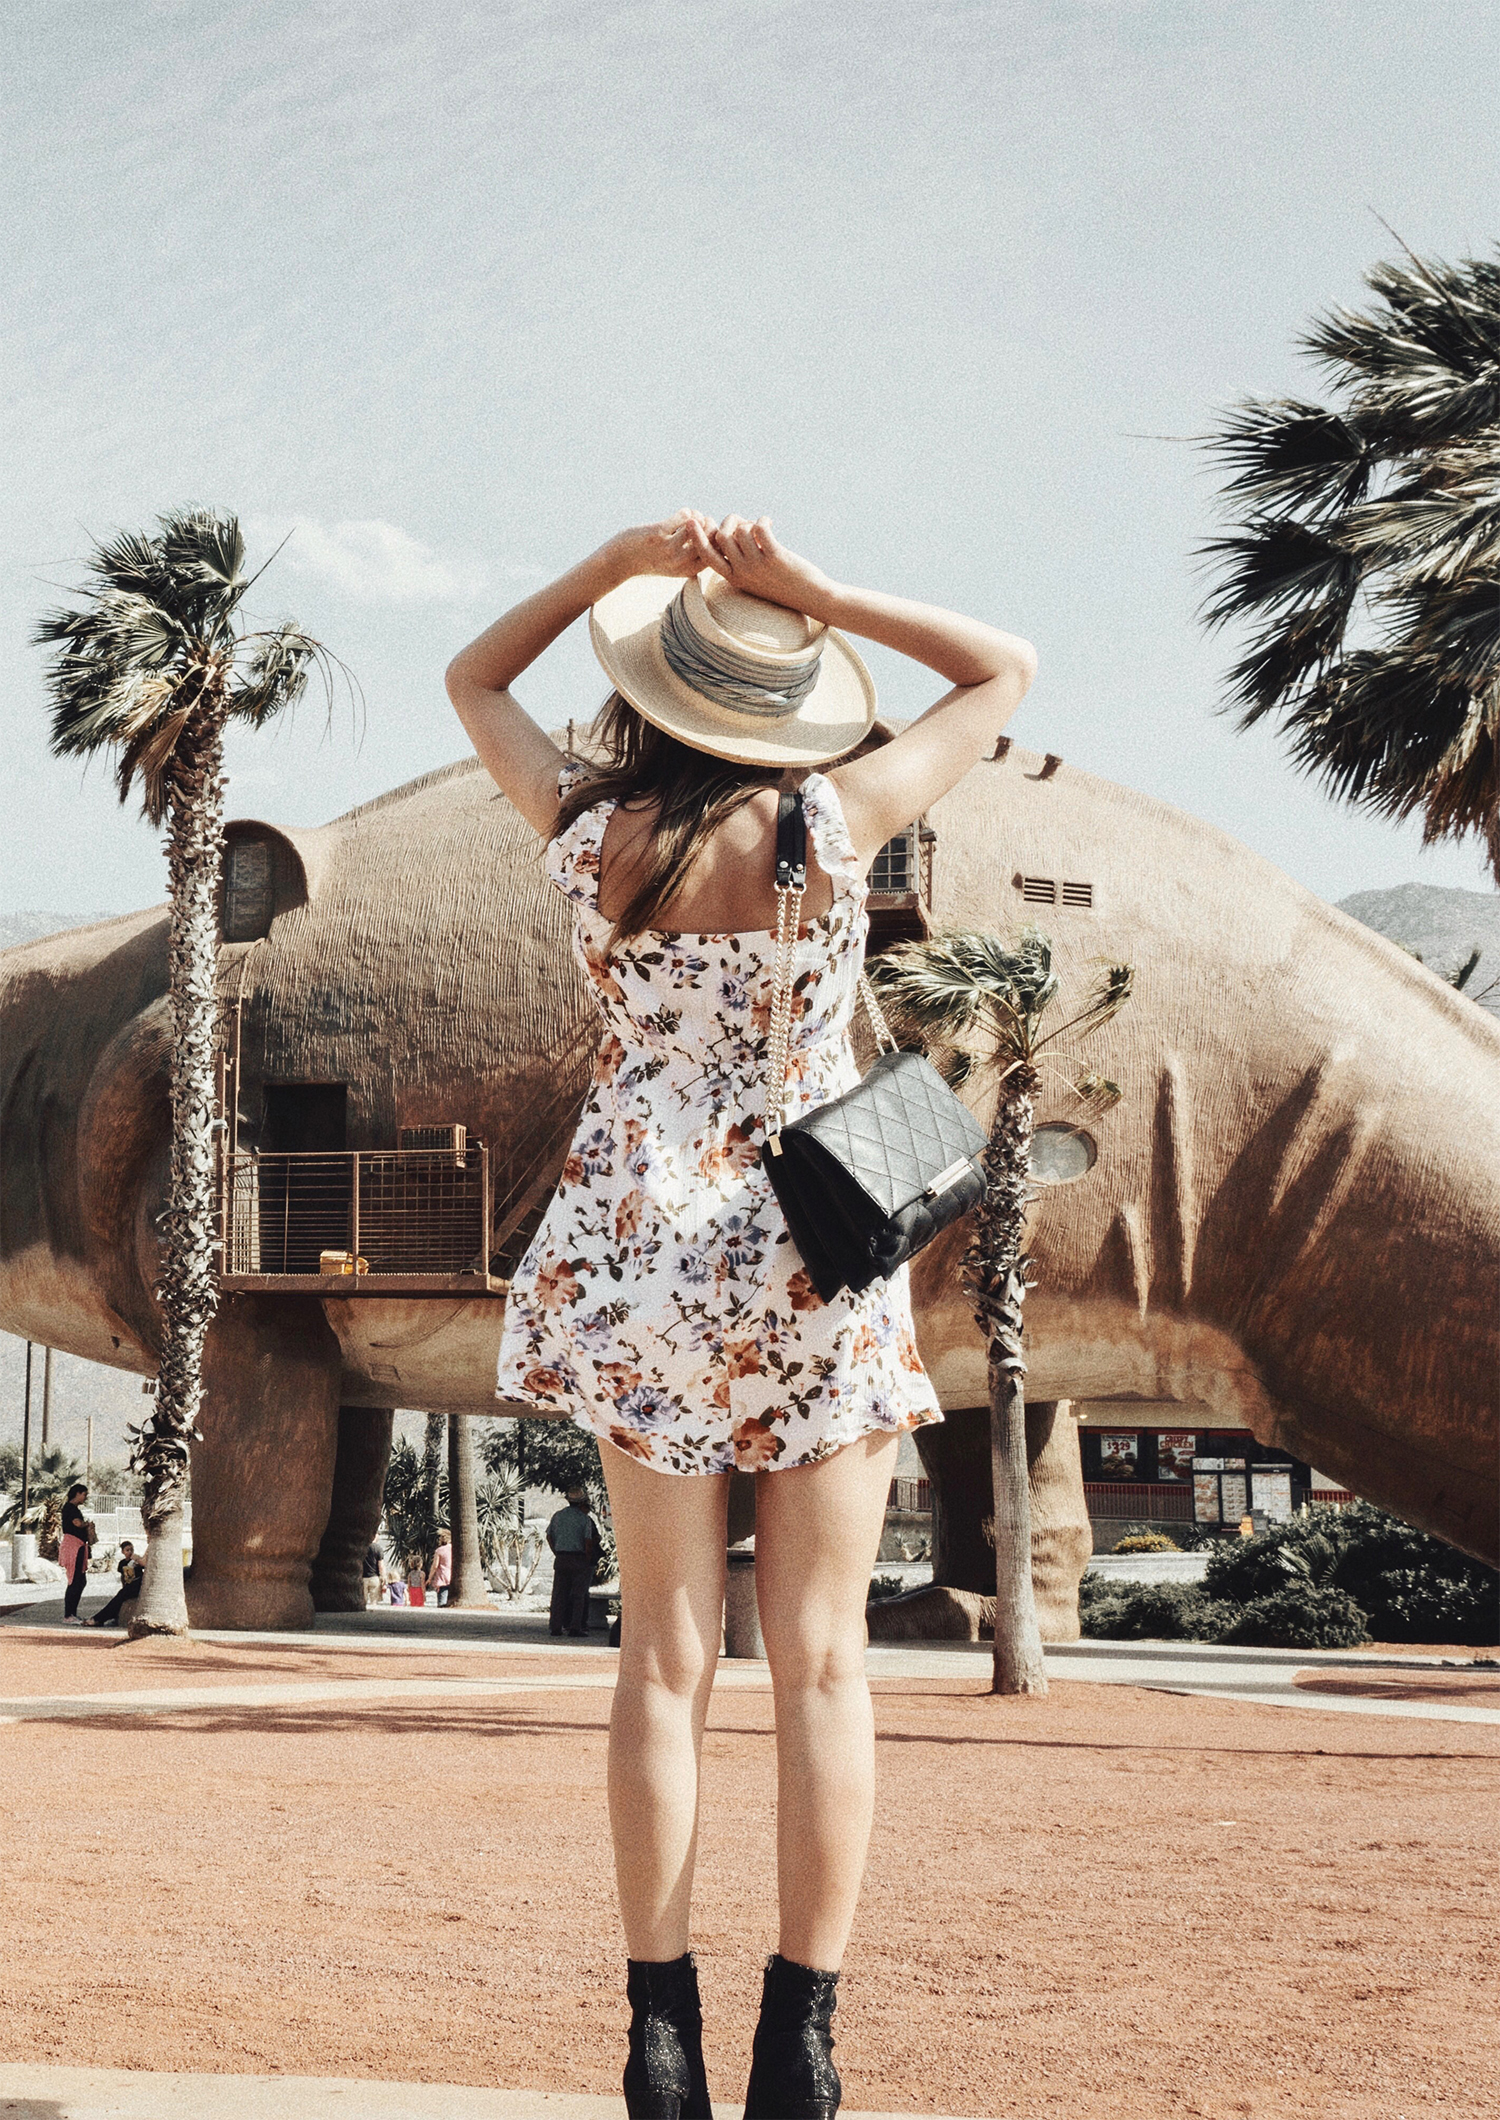 palm_springs_thewhiteocean_lenajuice_azalea_dress_california_13